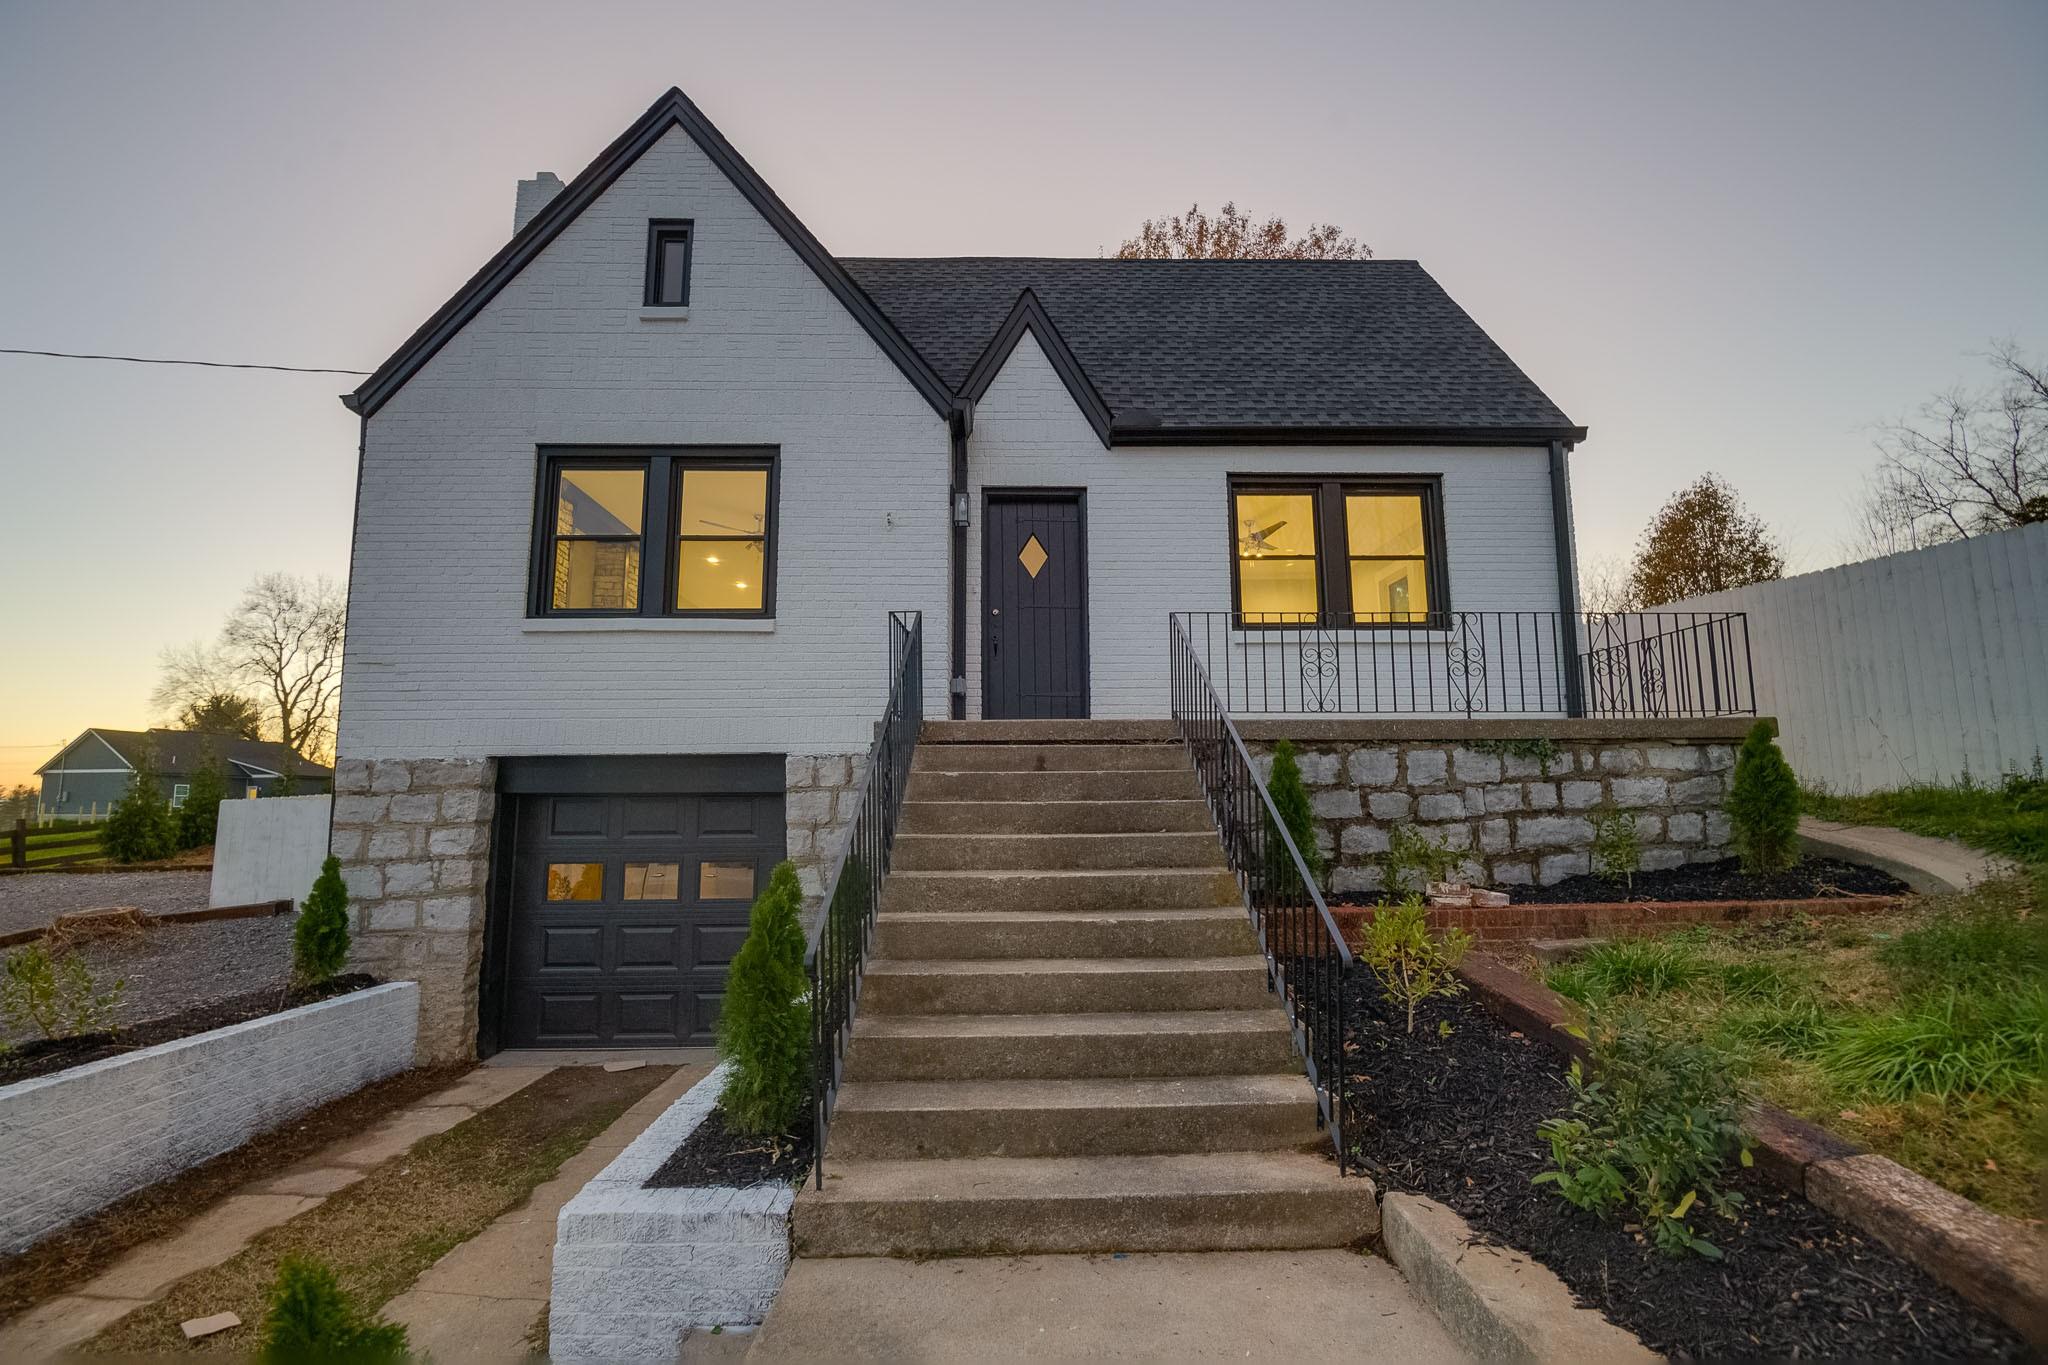 730 Kingree Rd Property Photo - Shelbyville, TN real estate listing